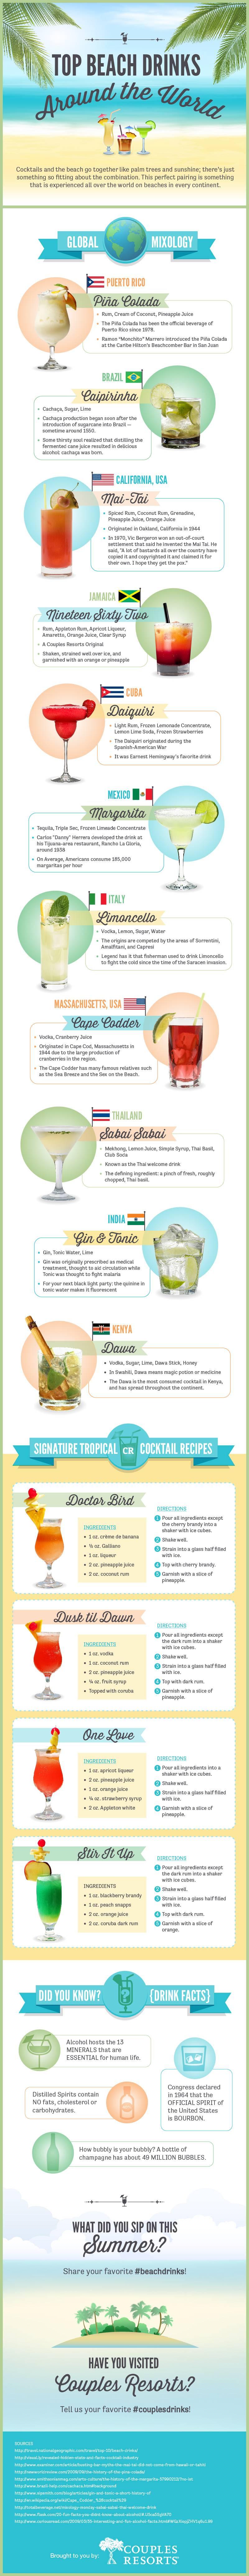 Infographic: Top Beach Drinks Around the World #infographic